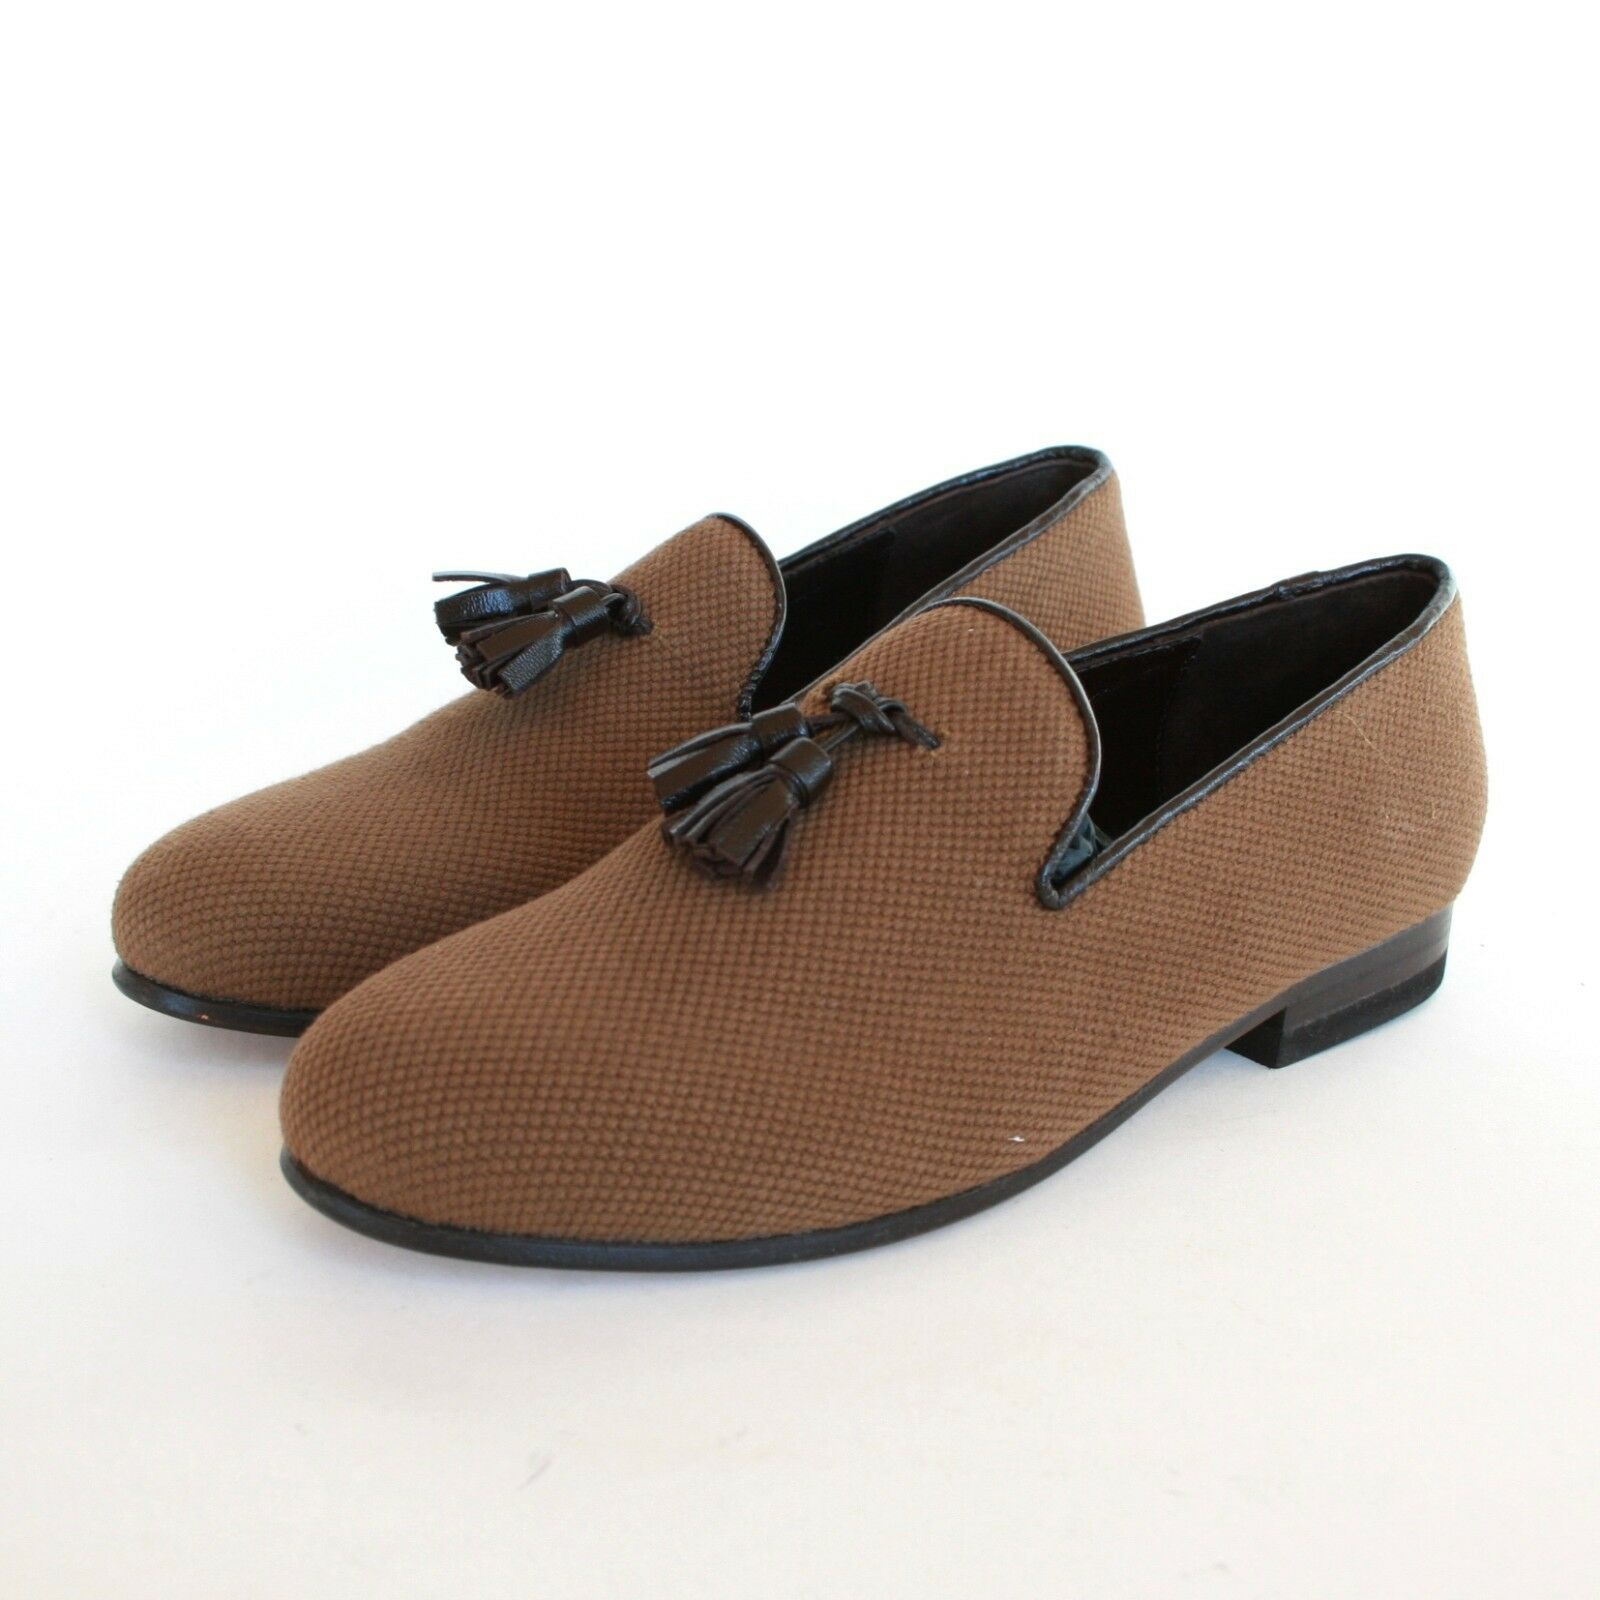 CB CECILIA BRINGHELI  400 canvas shoes tassel flats mocassin loafers 36 6 NEW